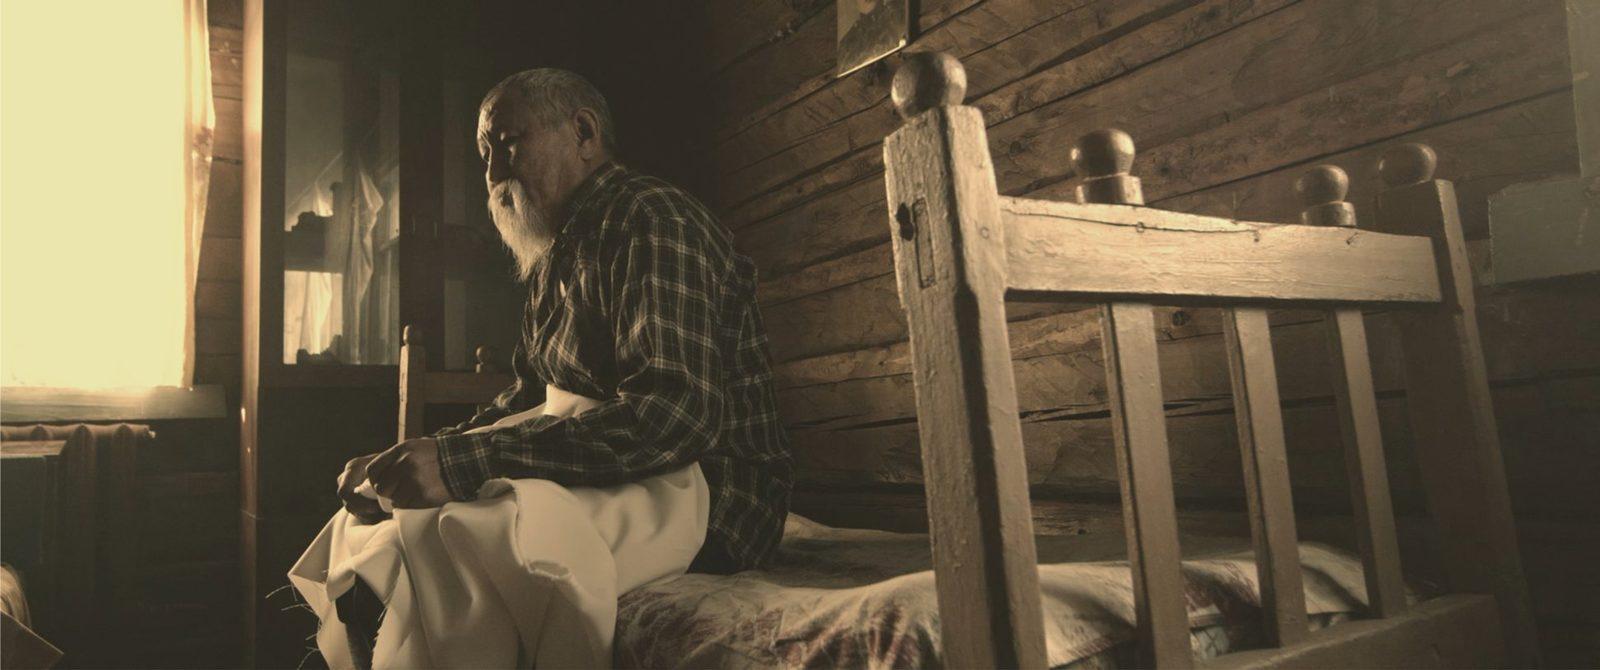 Якутское кино покажут онлайн